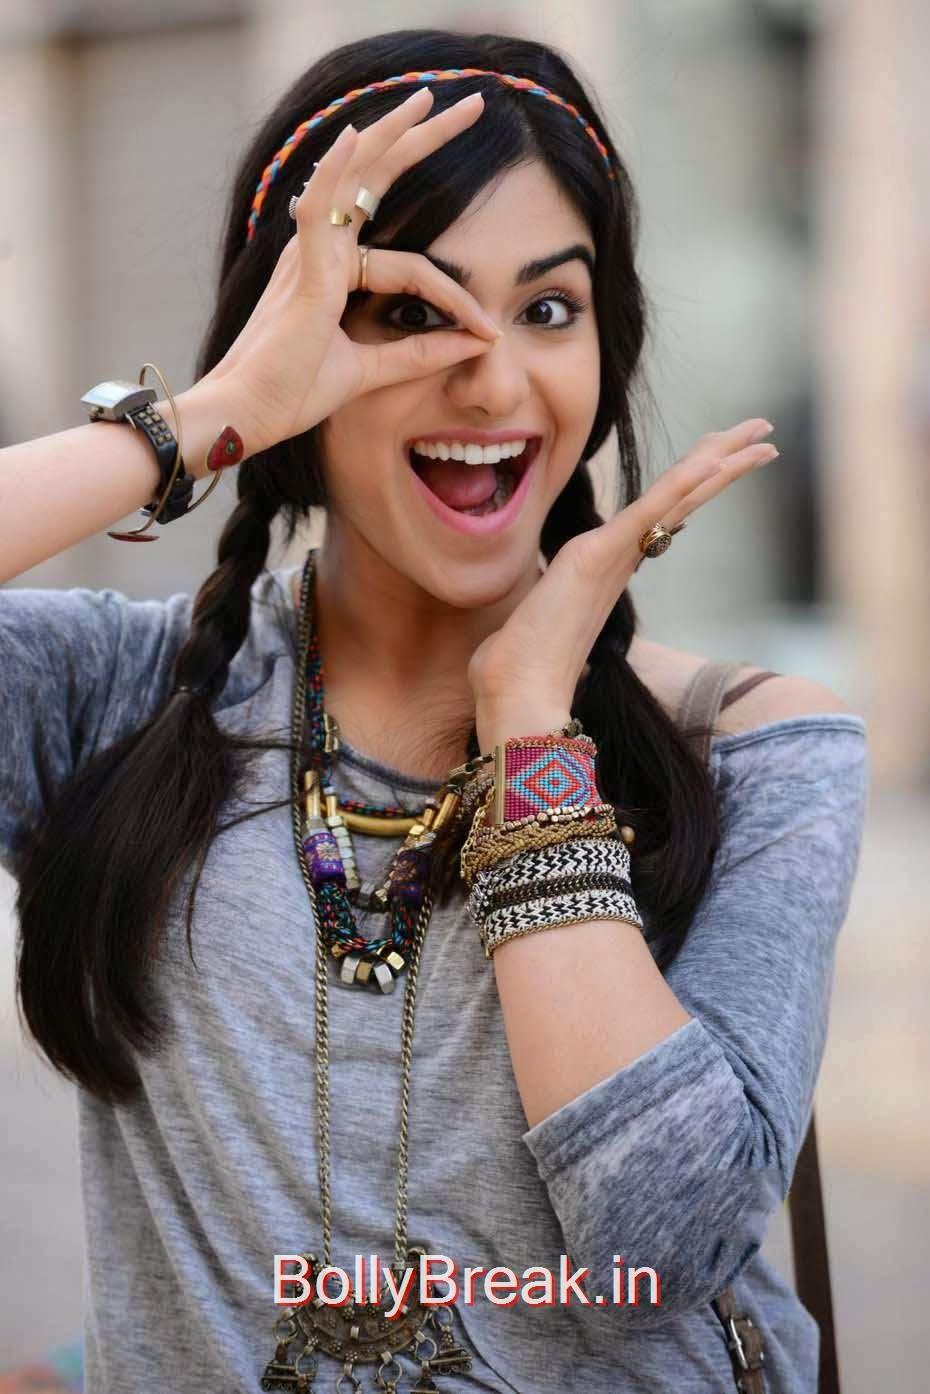 Tollywood Actress Adah Sharma, Adah Sharma Hot Pics In Grey and White Top